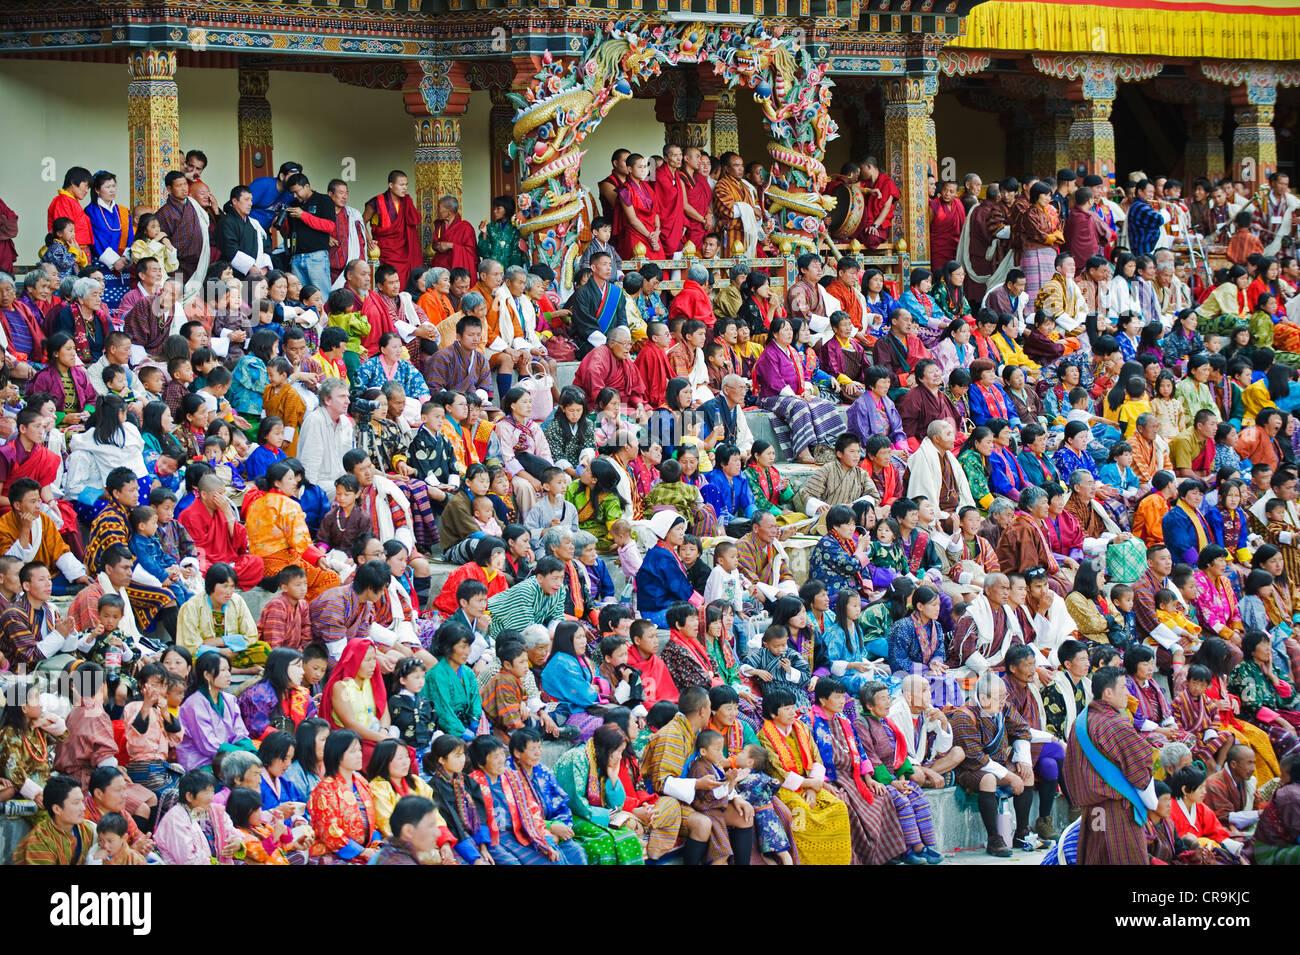 Autumn Tsechu festival at Trashi Chhoe Dzong, Thimpu, Bhutan, Asia Stock Photo